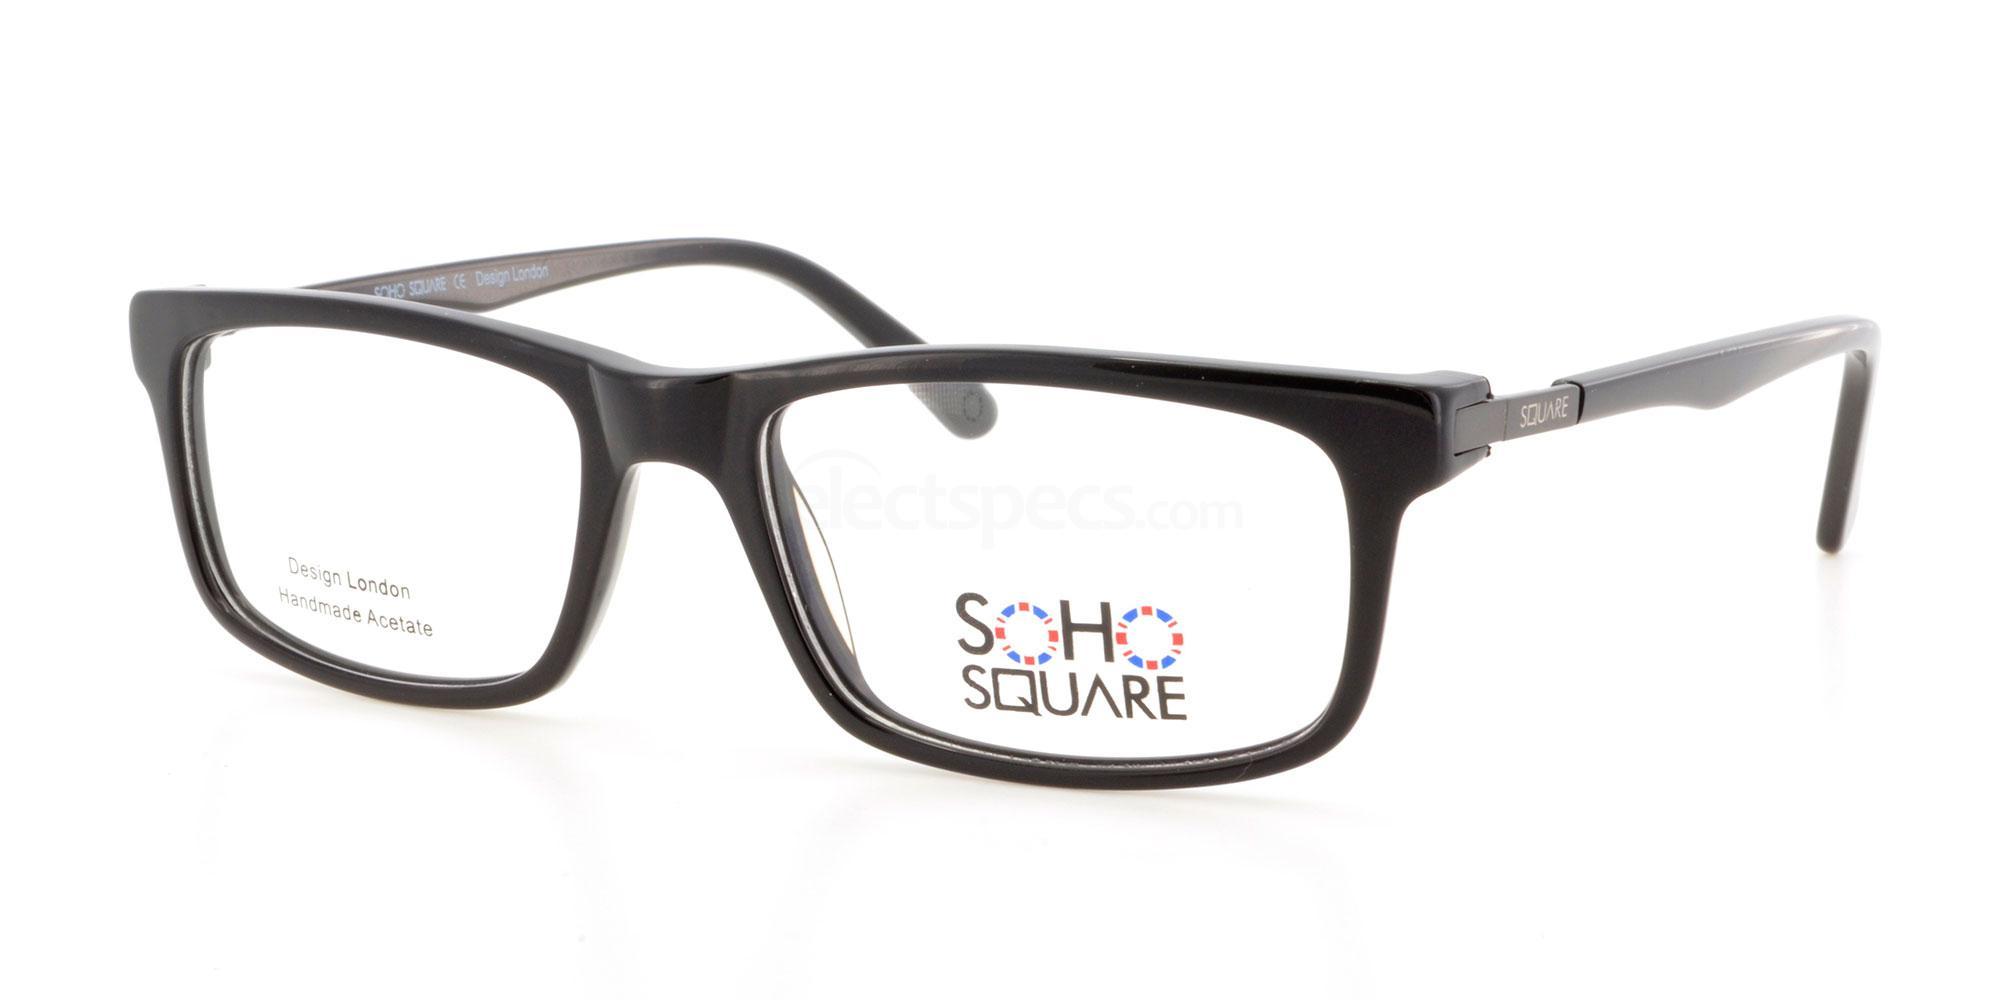 C1 SS 031 Glasses, Soho Square